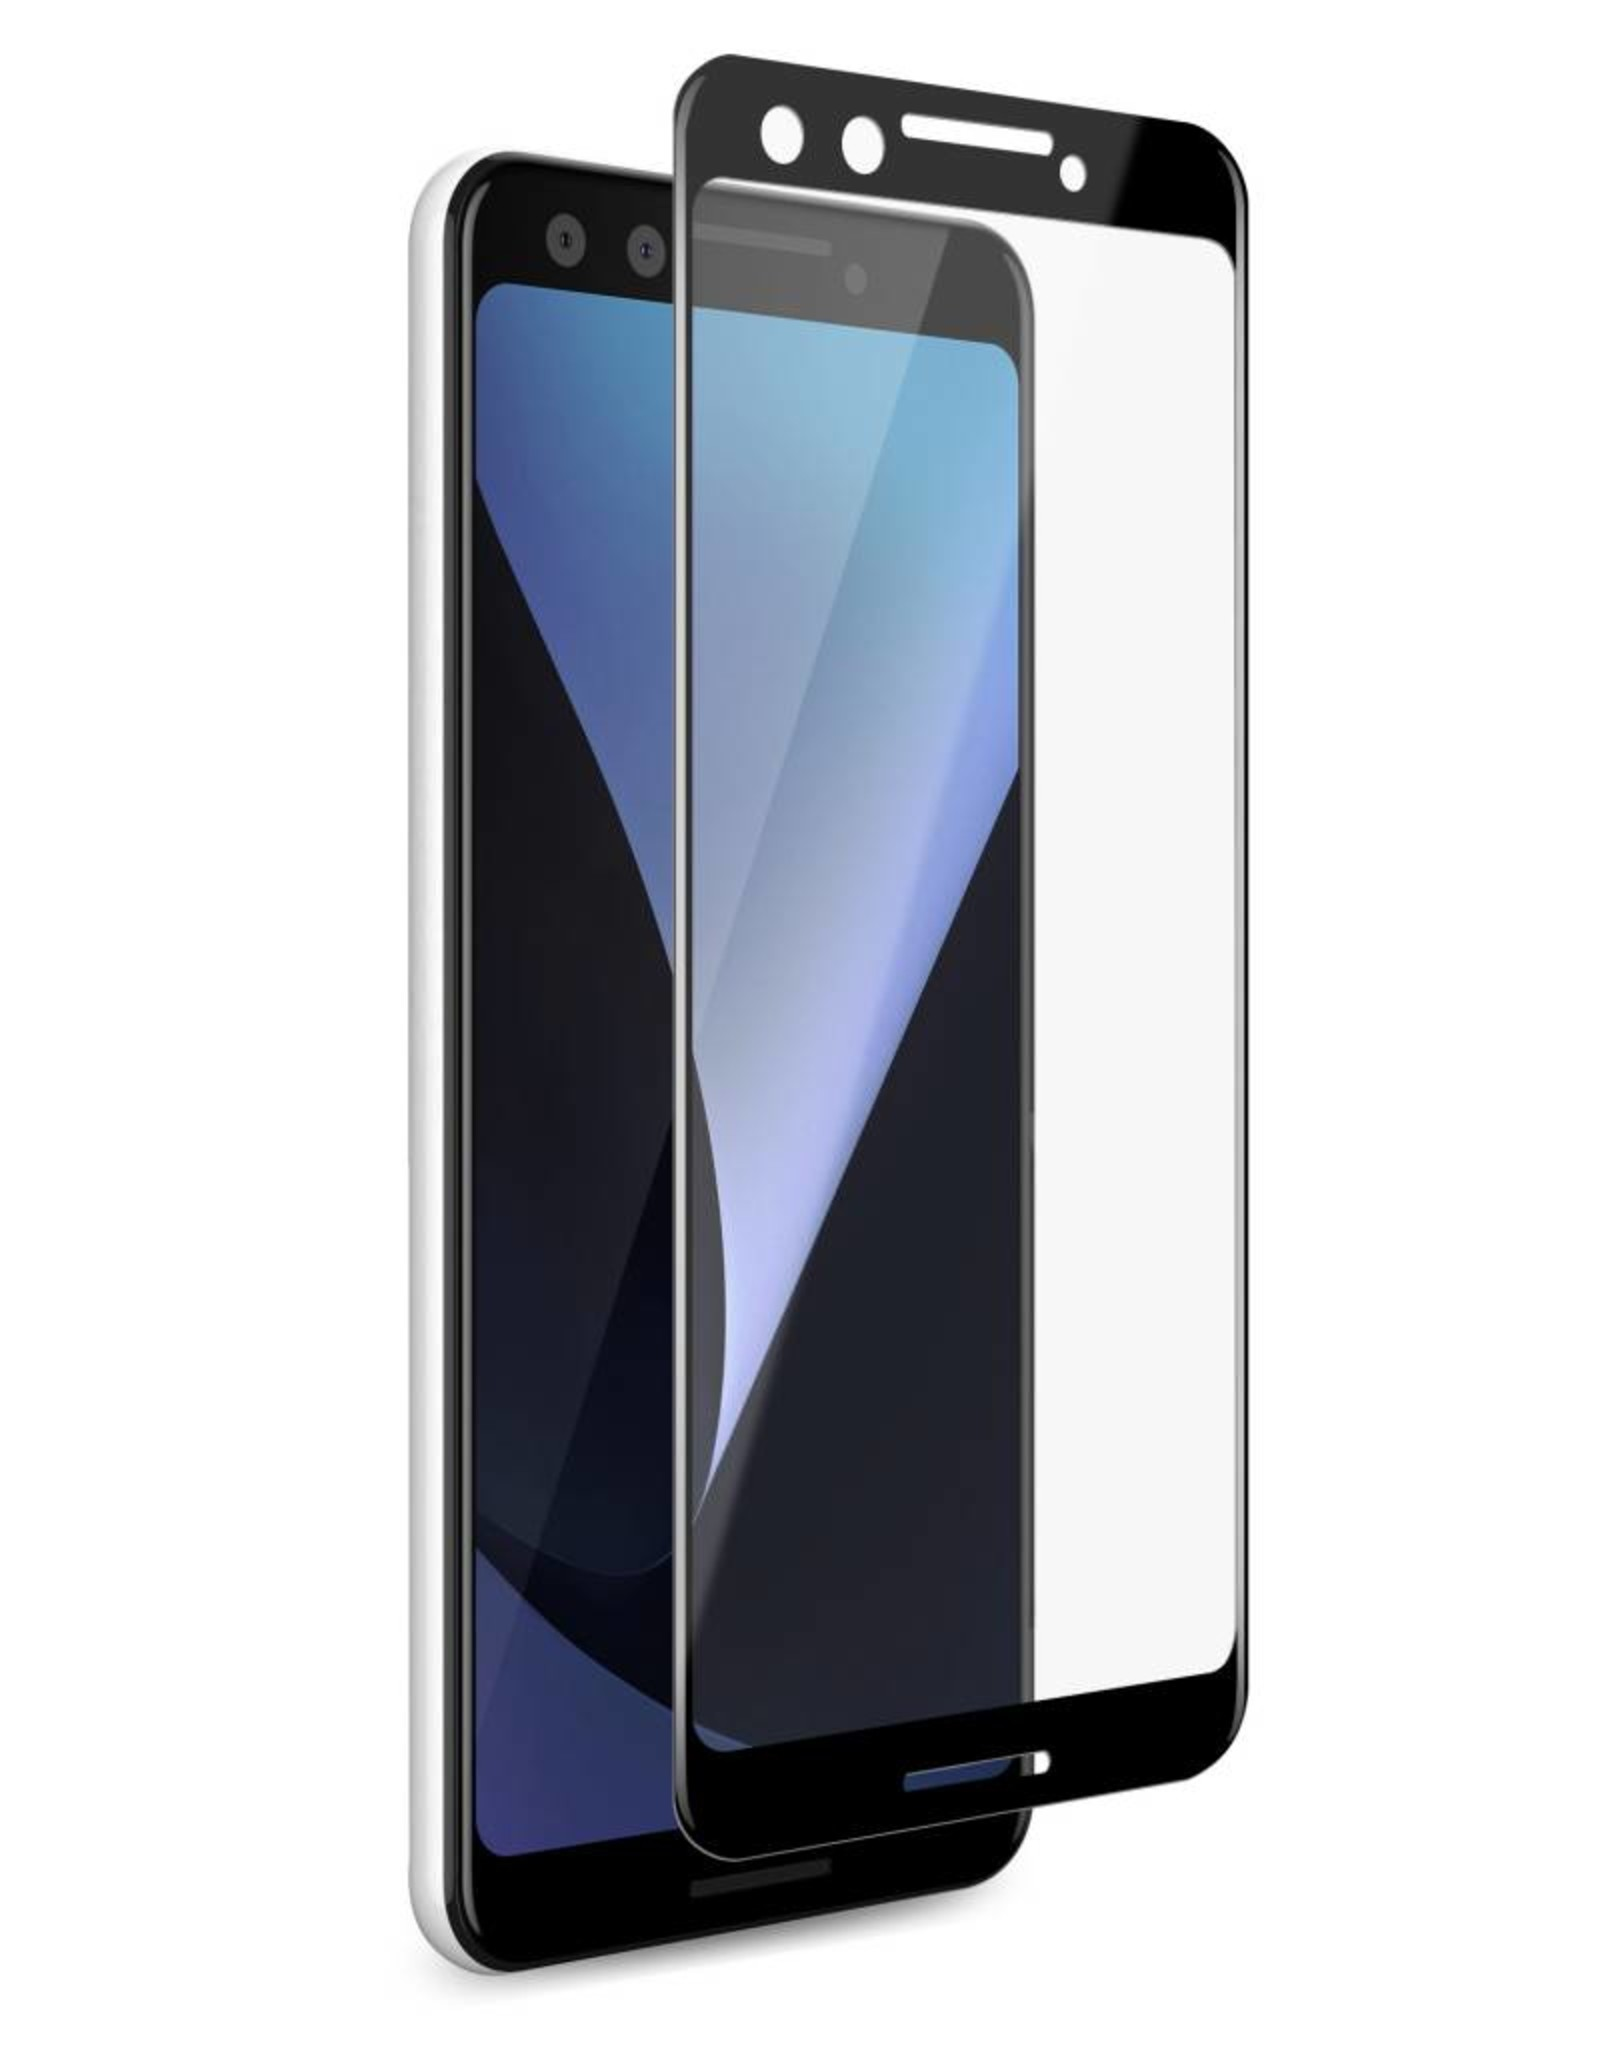 Blu Element Blu Element | Google Pixel 3 3D Curved Glass Screen Protector | 118-2049